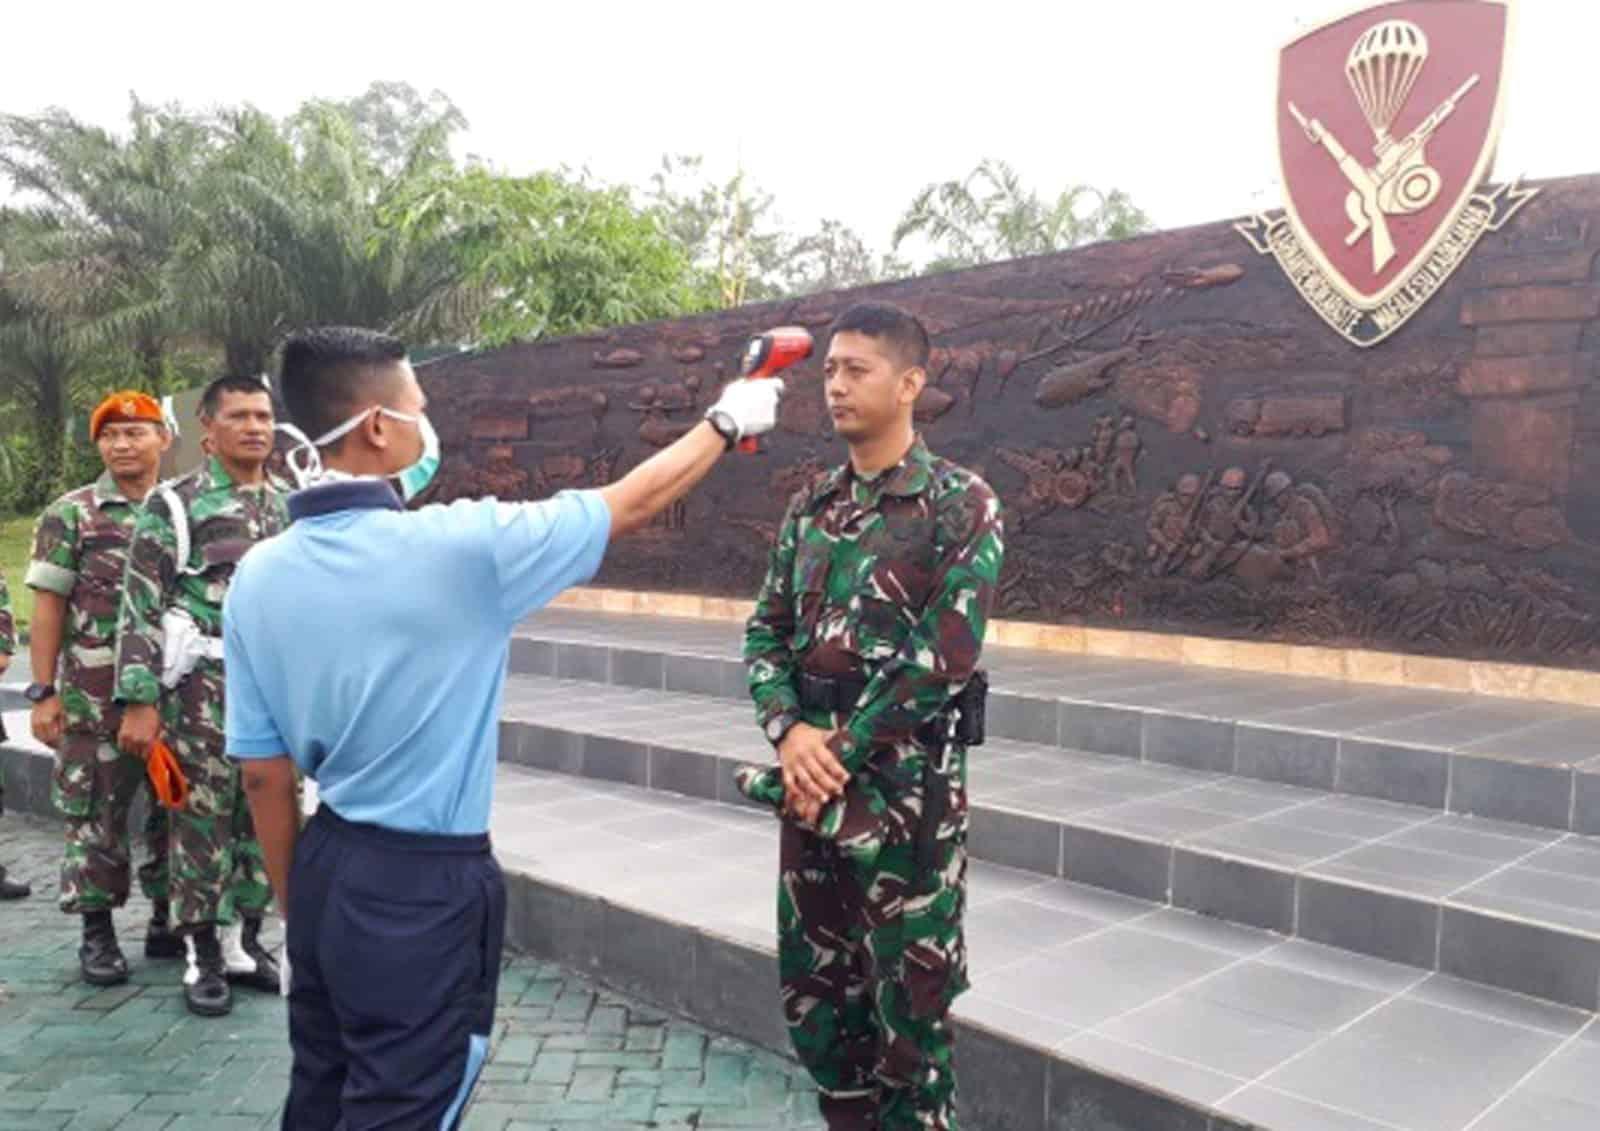 Yonko 462 Paskhas Laksanakan Pemeriksaan Suhu Tubuh dan Budayakan Pola Hidup Sehat